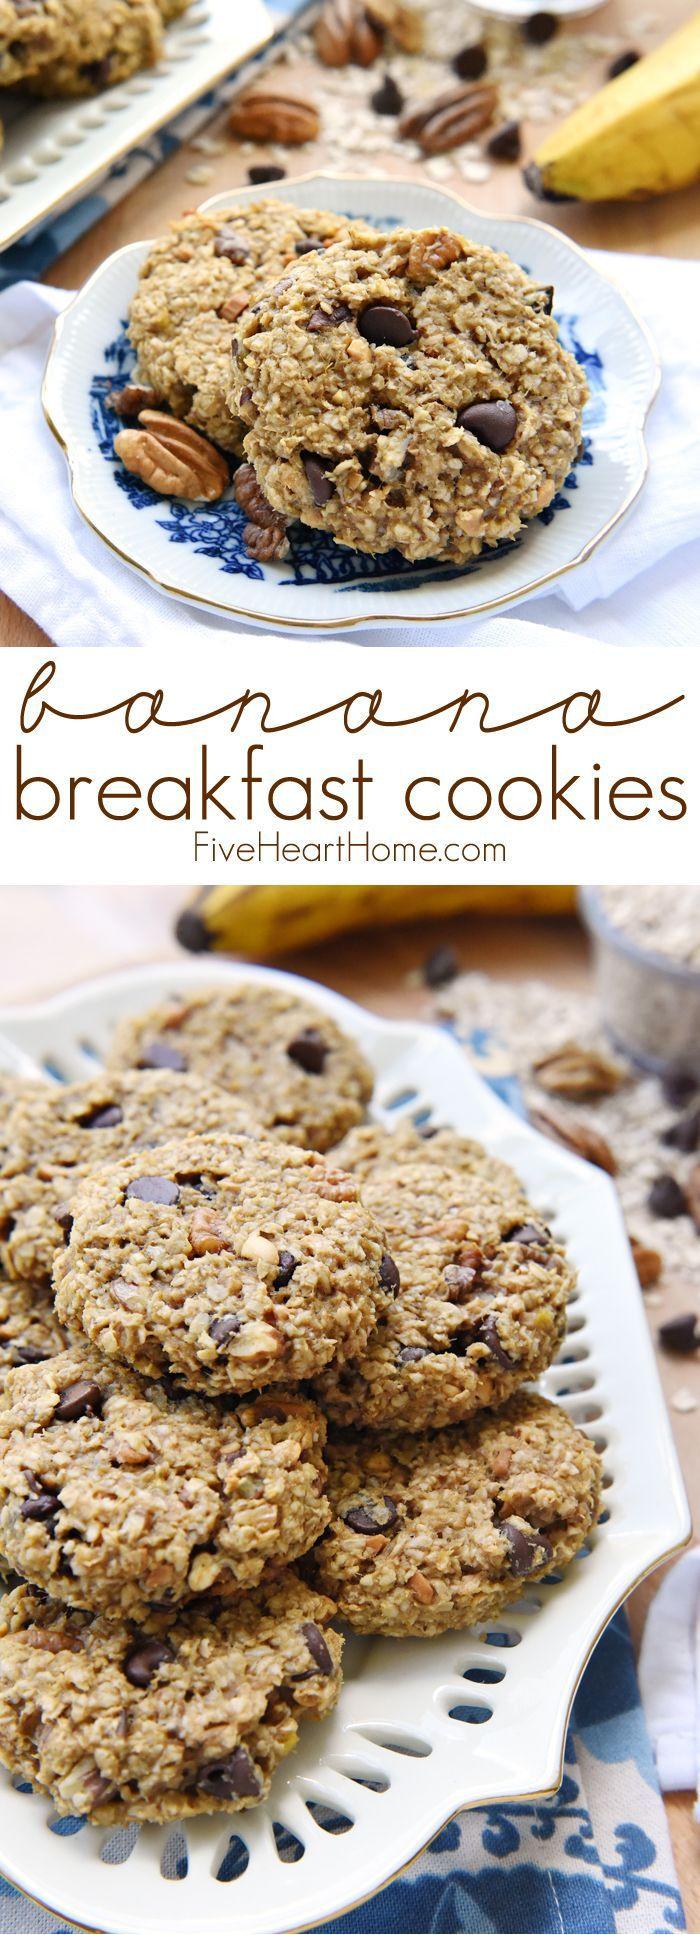 Banana Breakfast Recipes  Banana Breakfast Cookies a wholesome yummy breakfast on